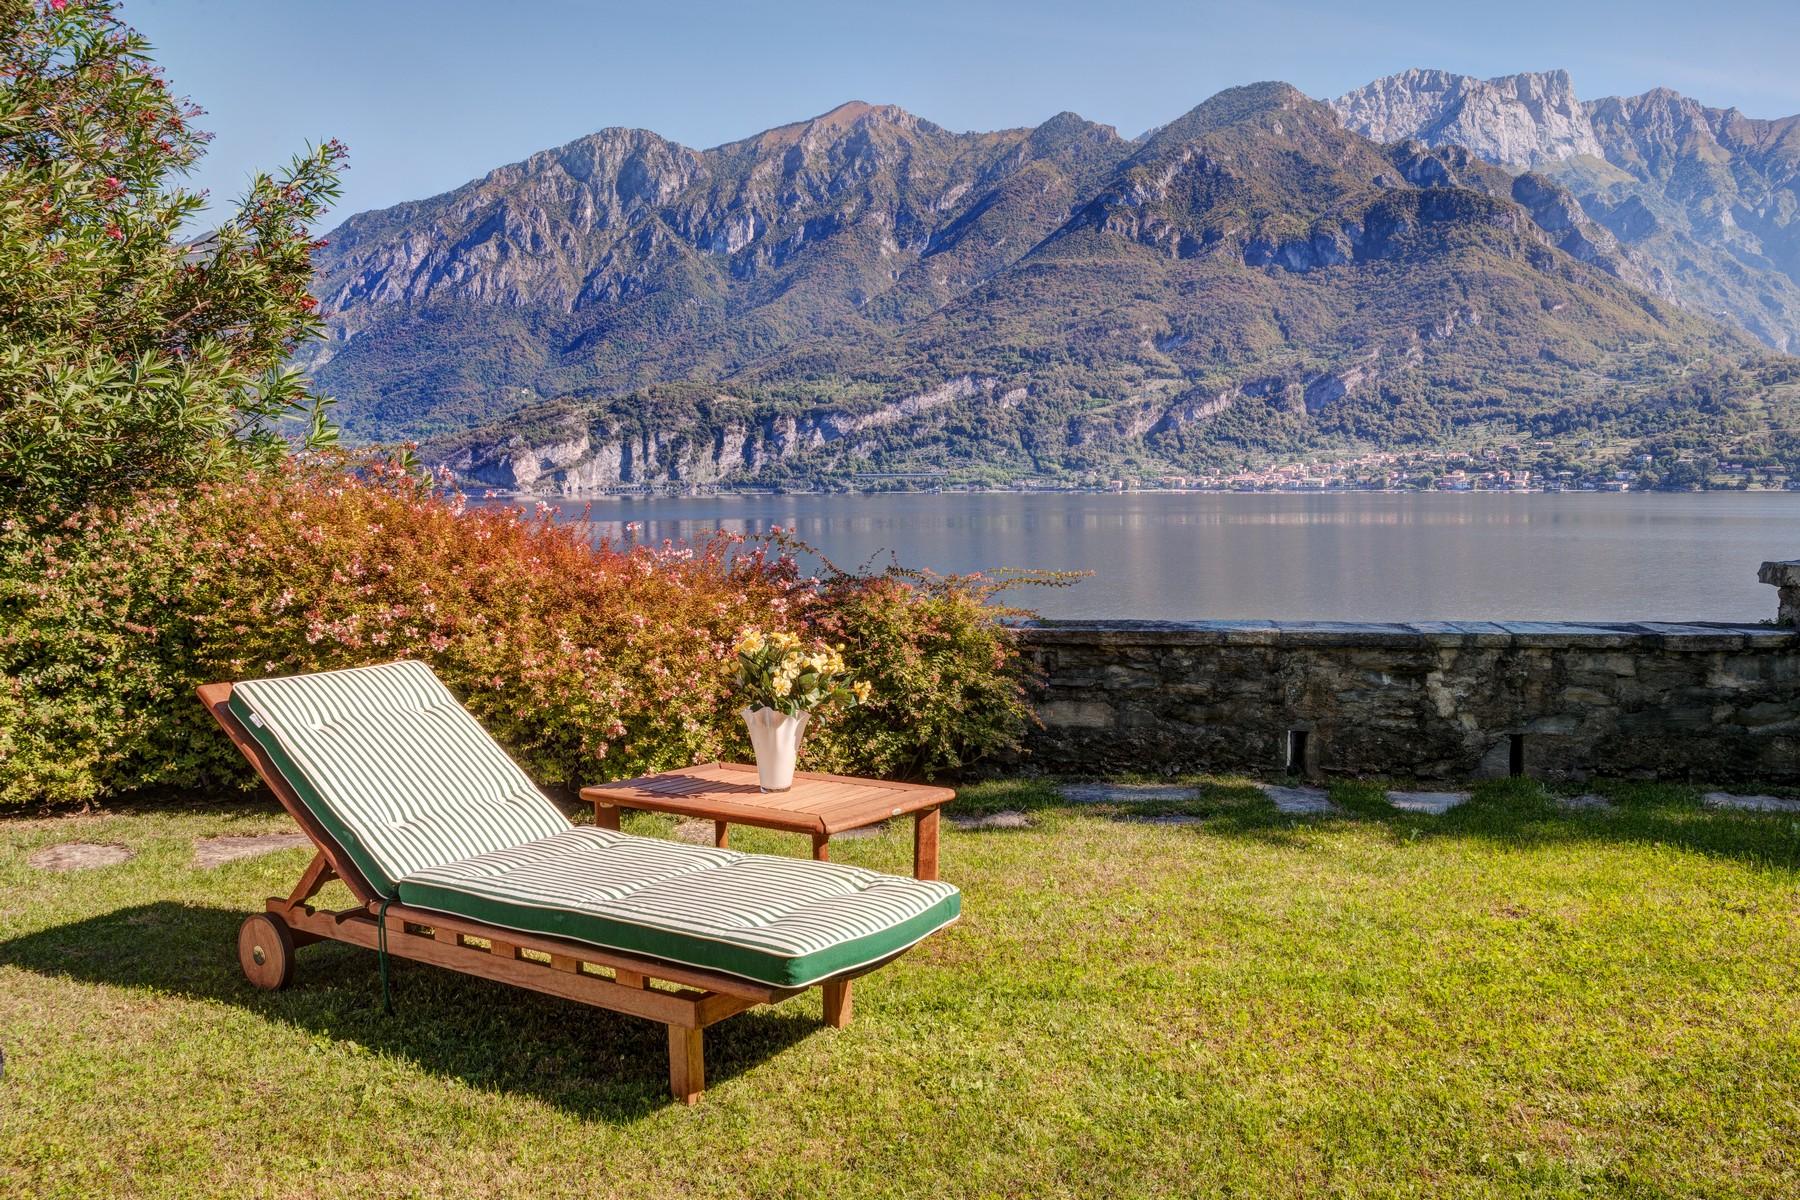 Additional photo for property listing at Magnificent property pieds dans l'eau Via Cadorna Oliveto Lario, Lecco 23865 Italien